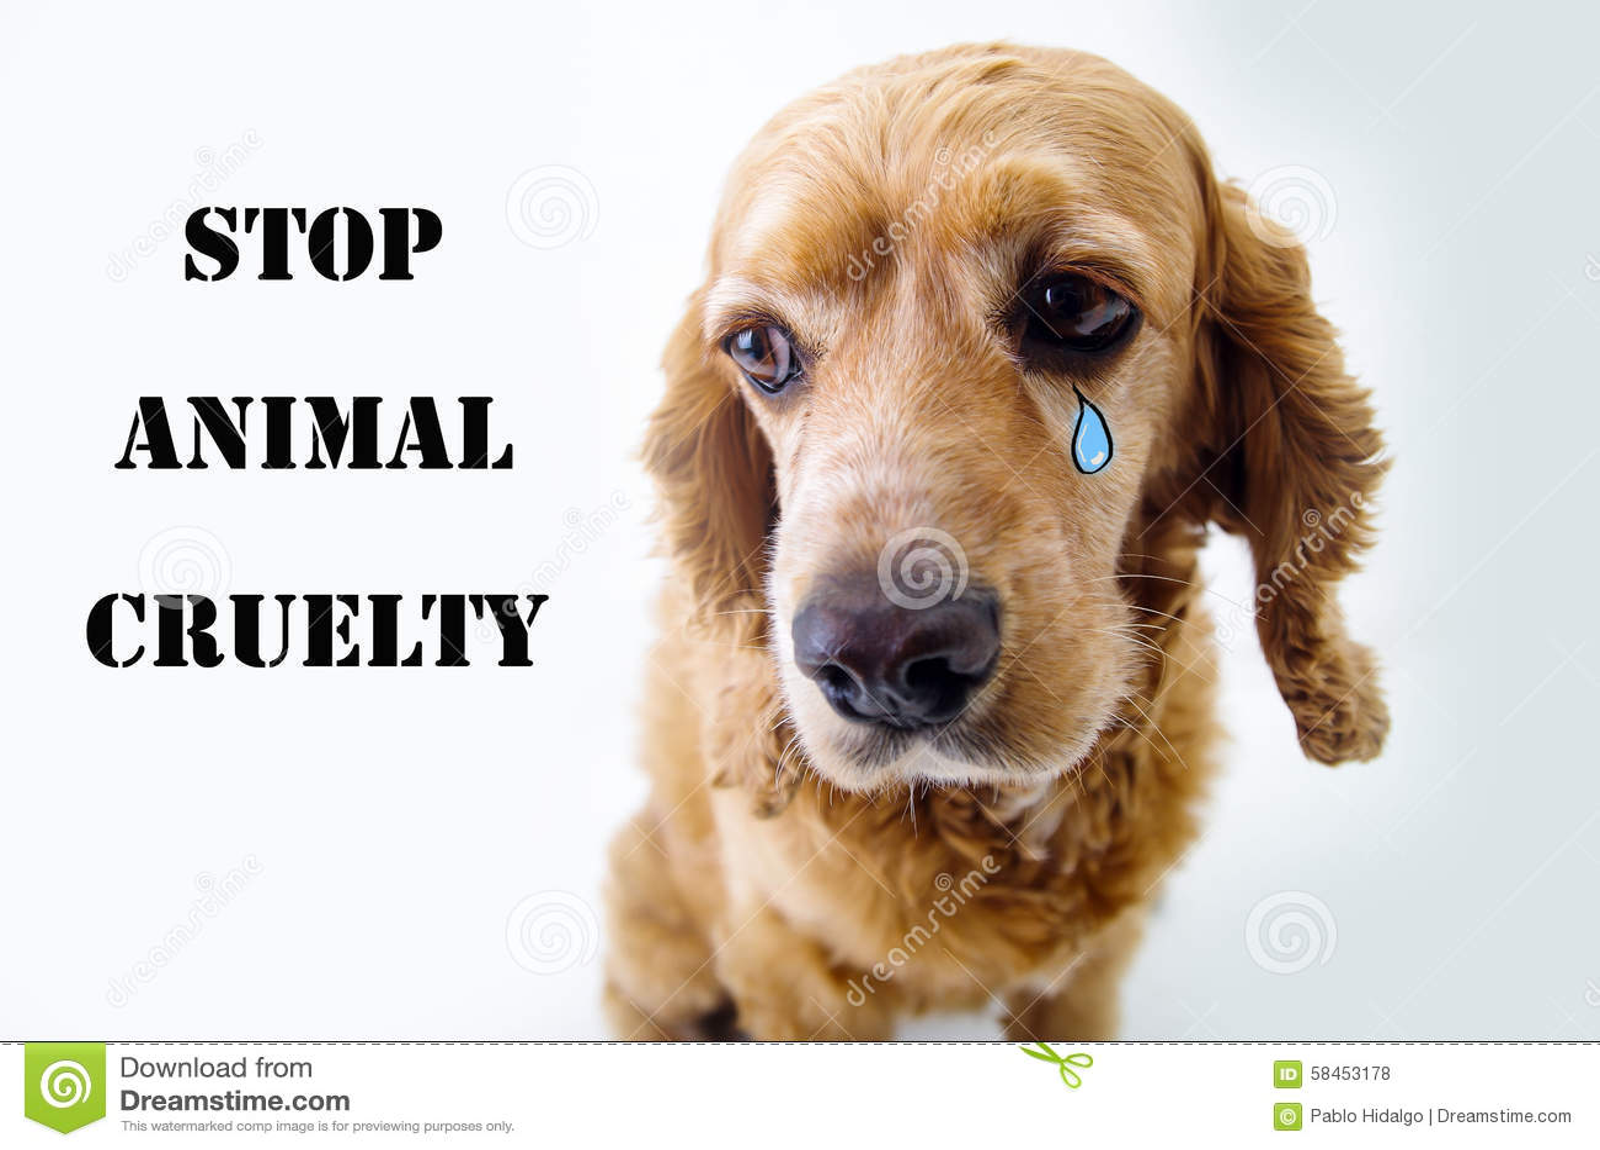 how to avoid animal cruelty